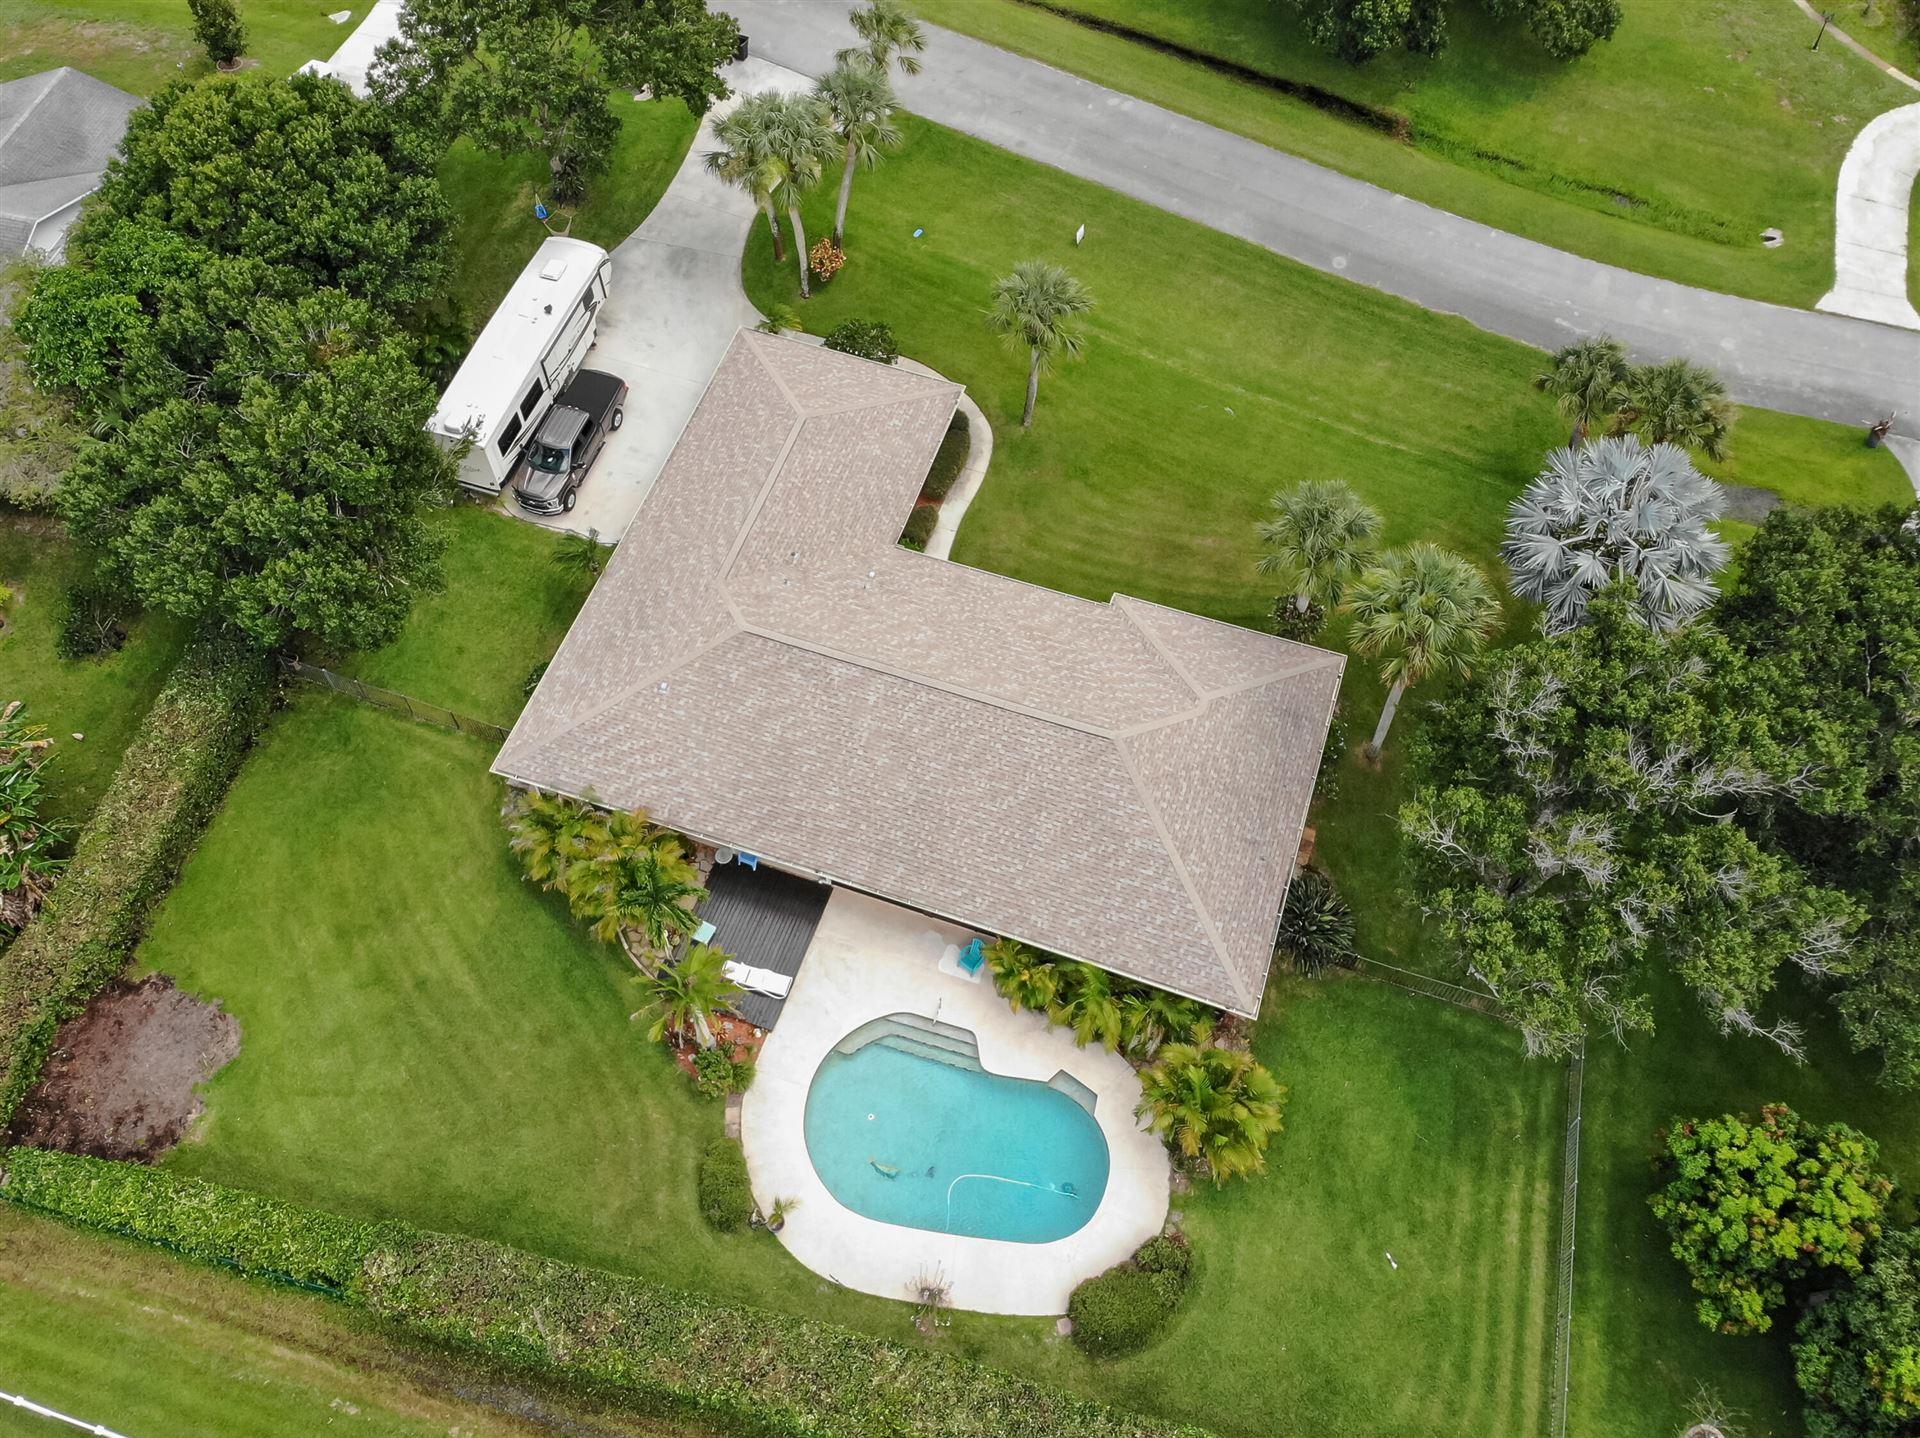 Photo of 1106 Kingswood Lane, Fort Pierce, FL 34982 (MLS # RX-10736249)